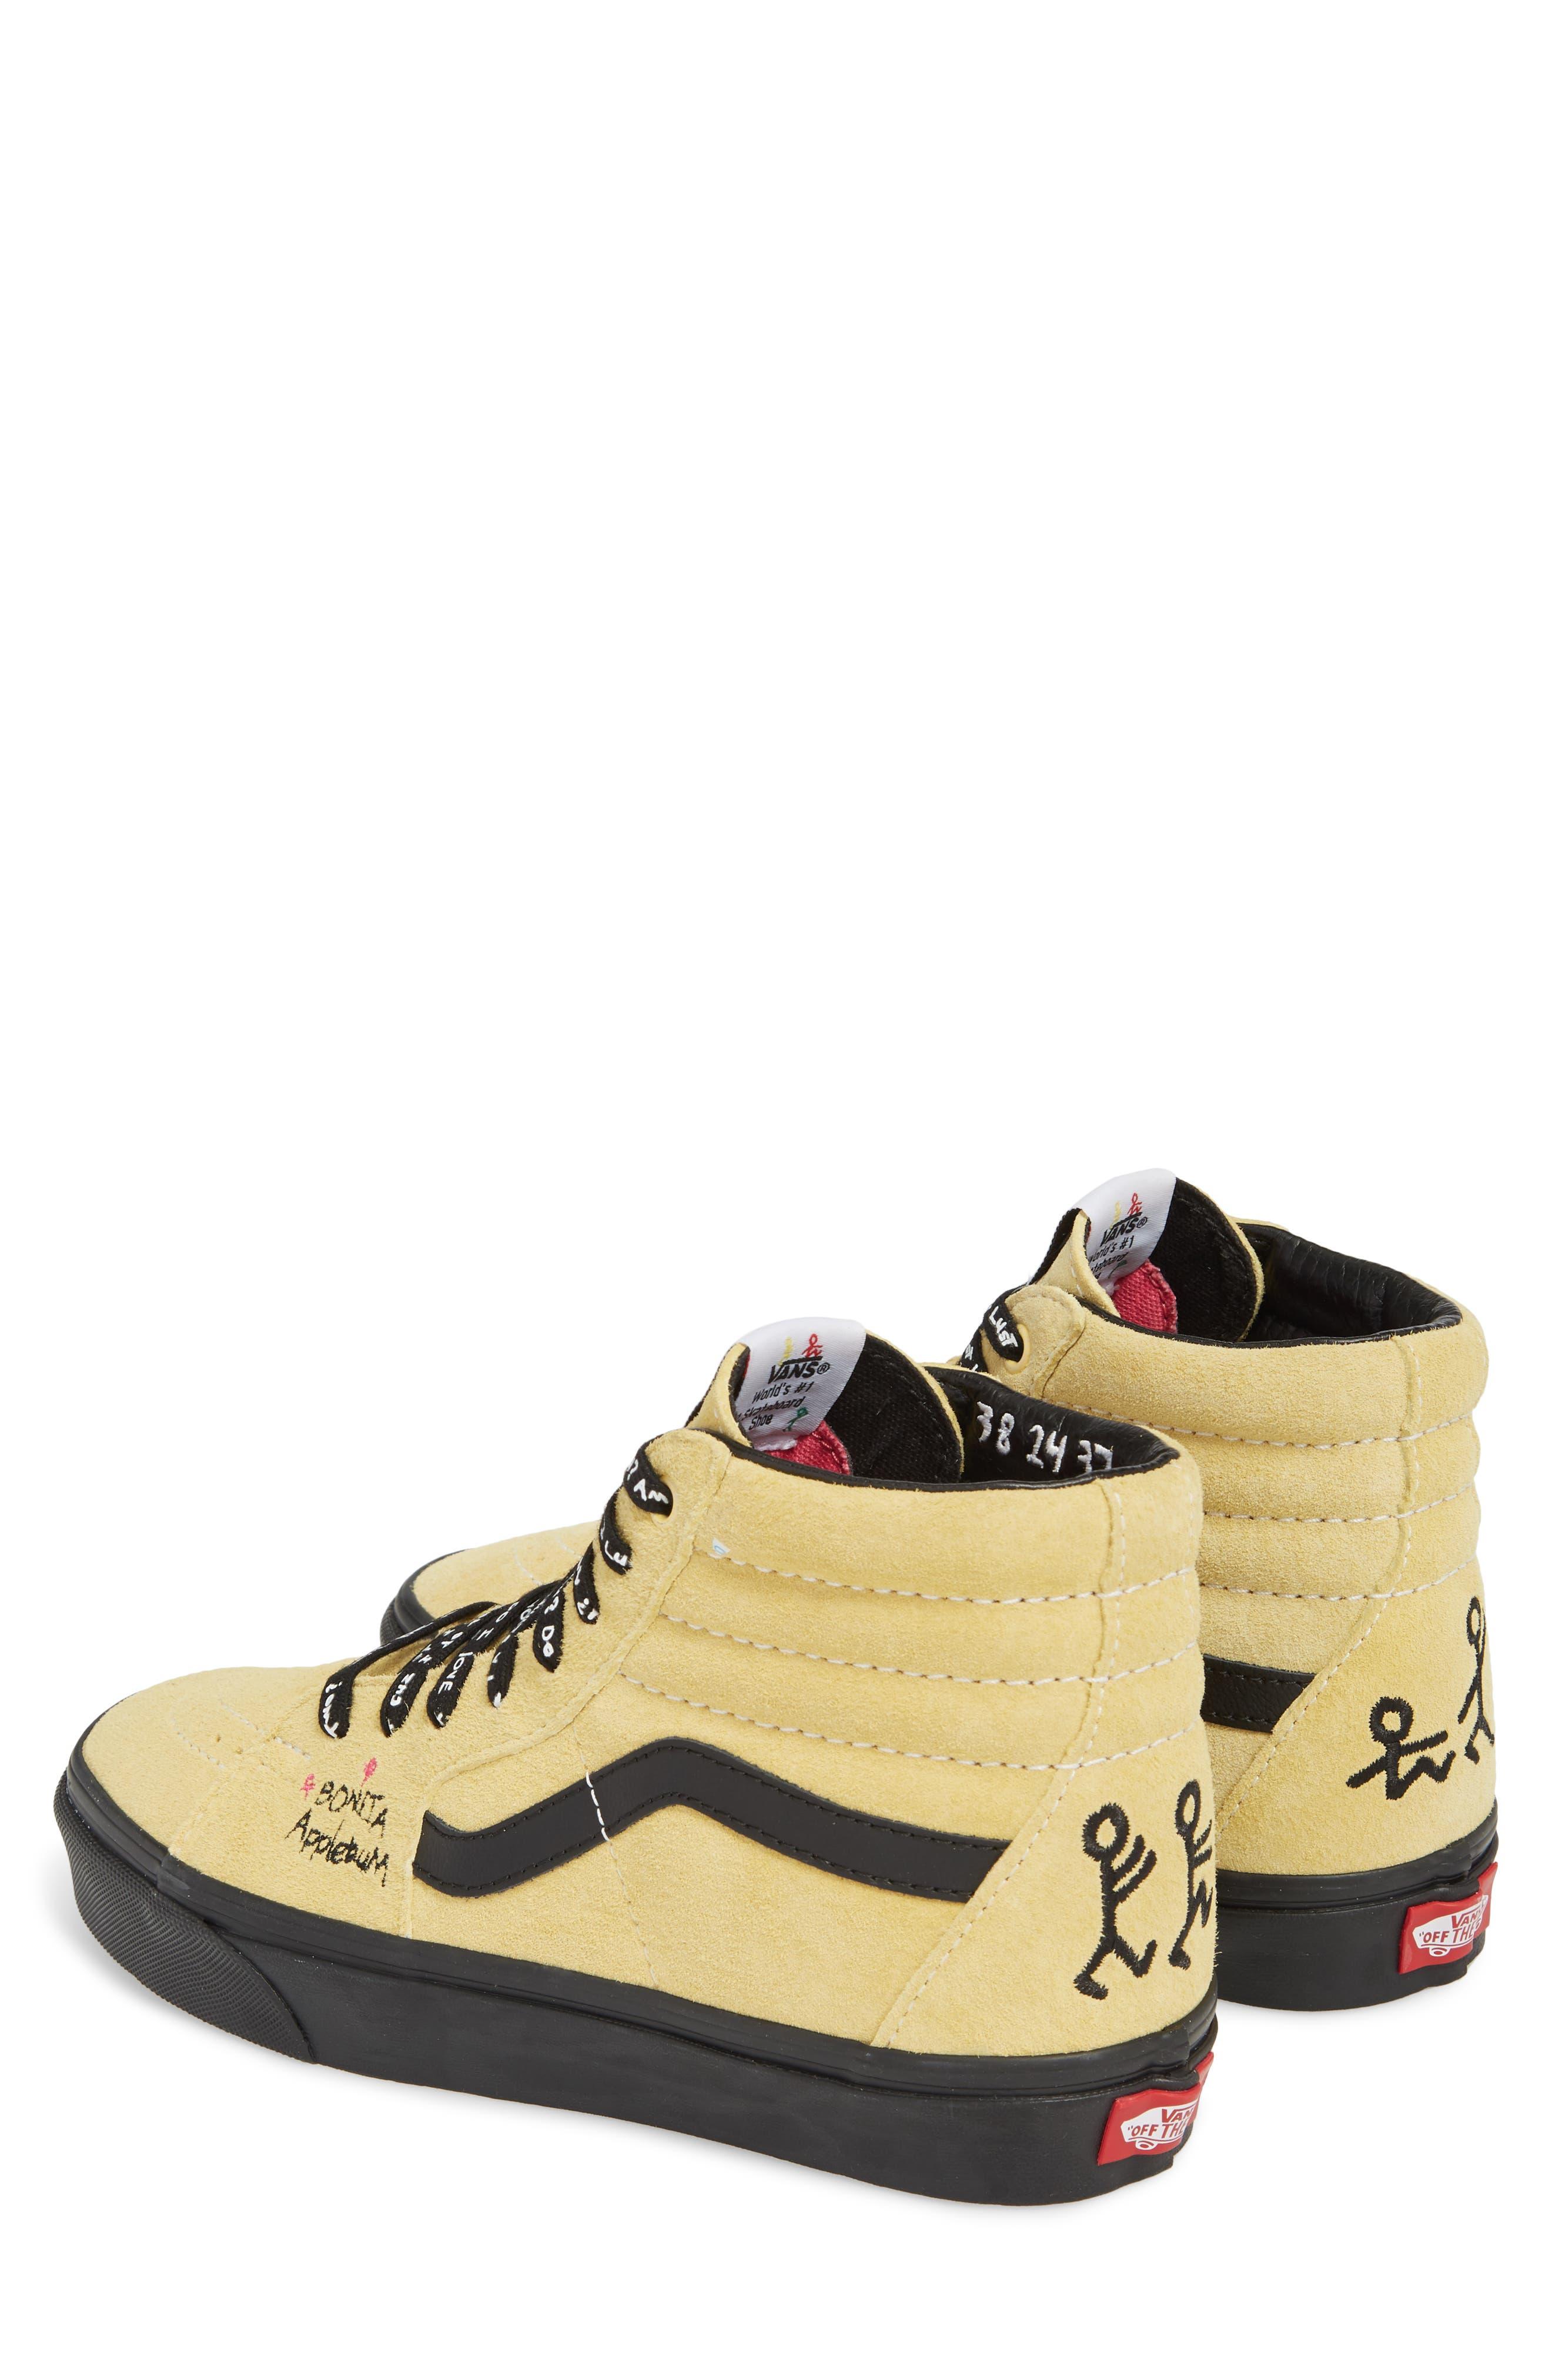 ATCQ Sk8-Hi Sneaker,                             Alternate thumbnail 3, color,                             720